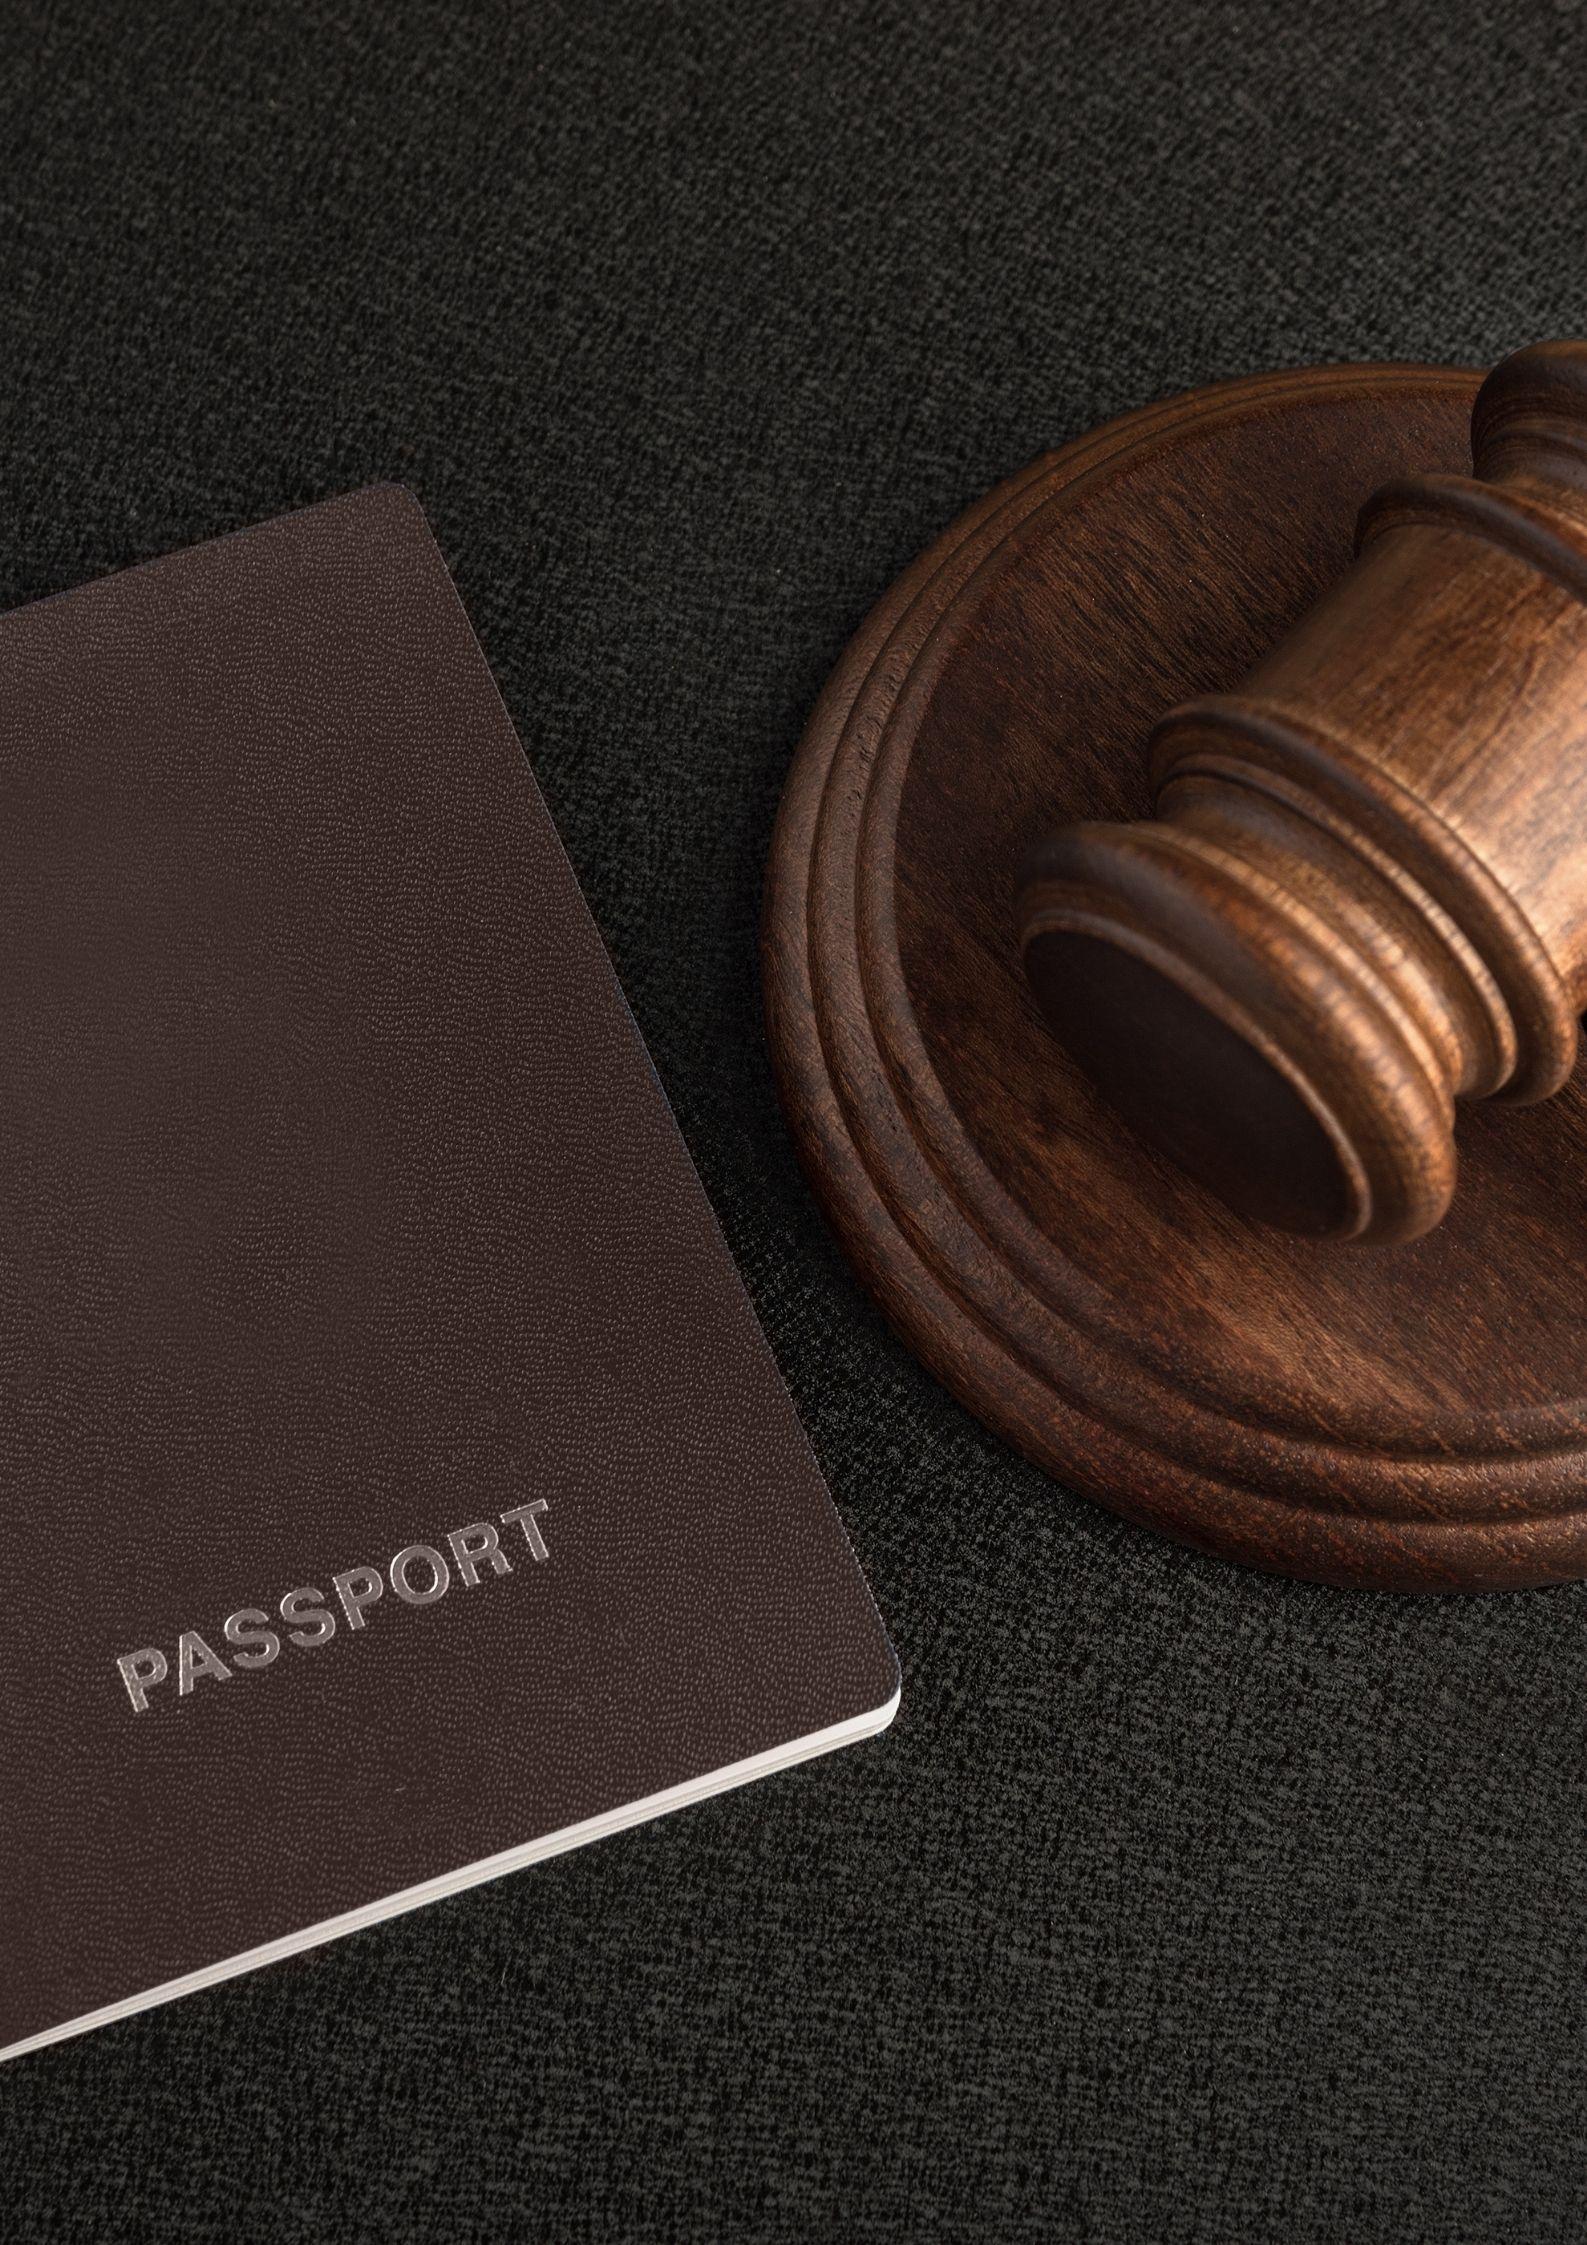 citizenship law passport